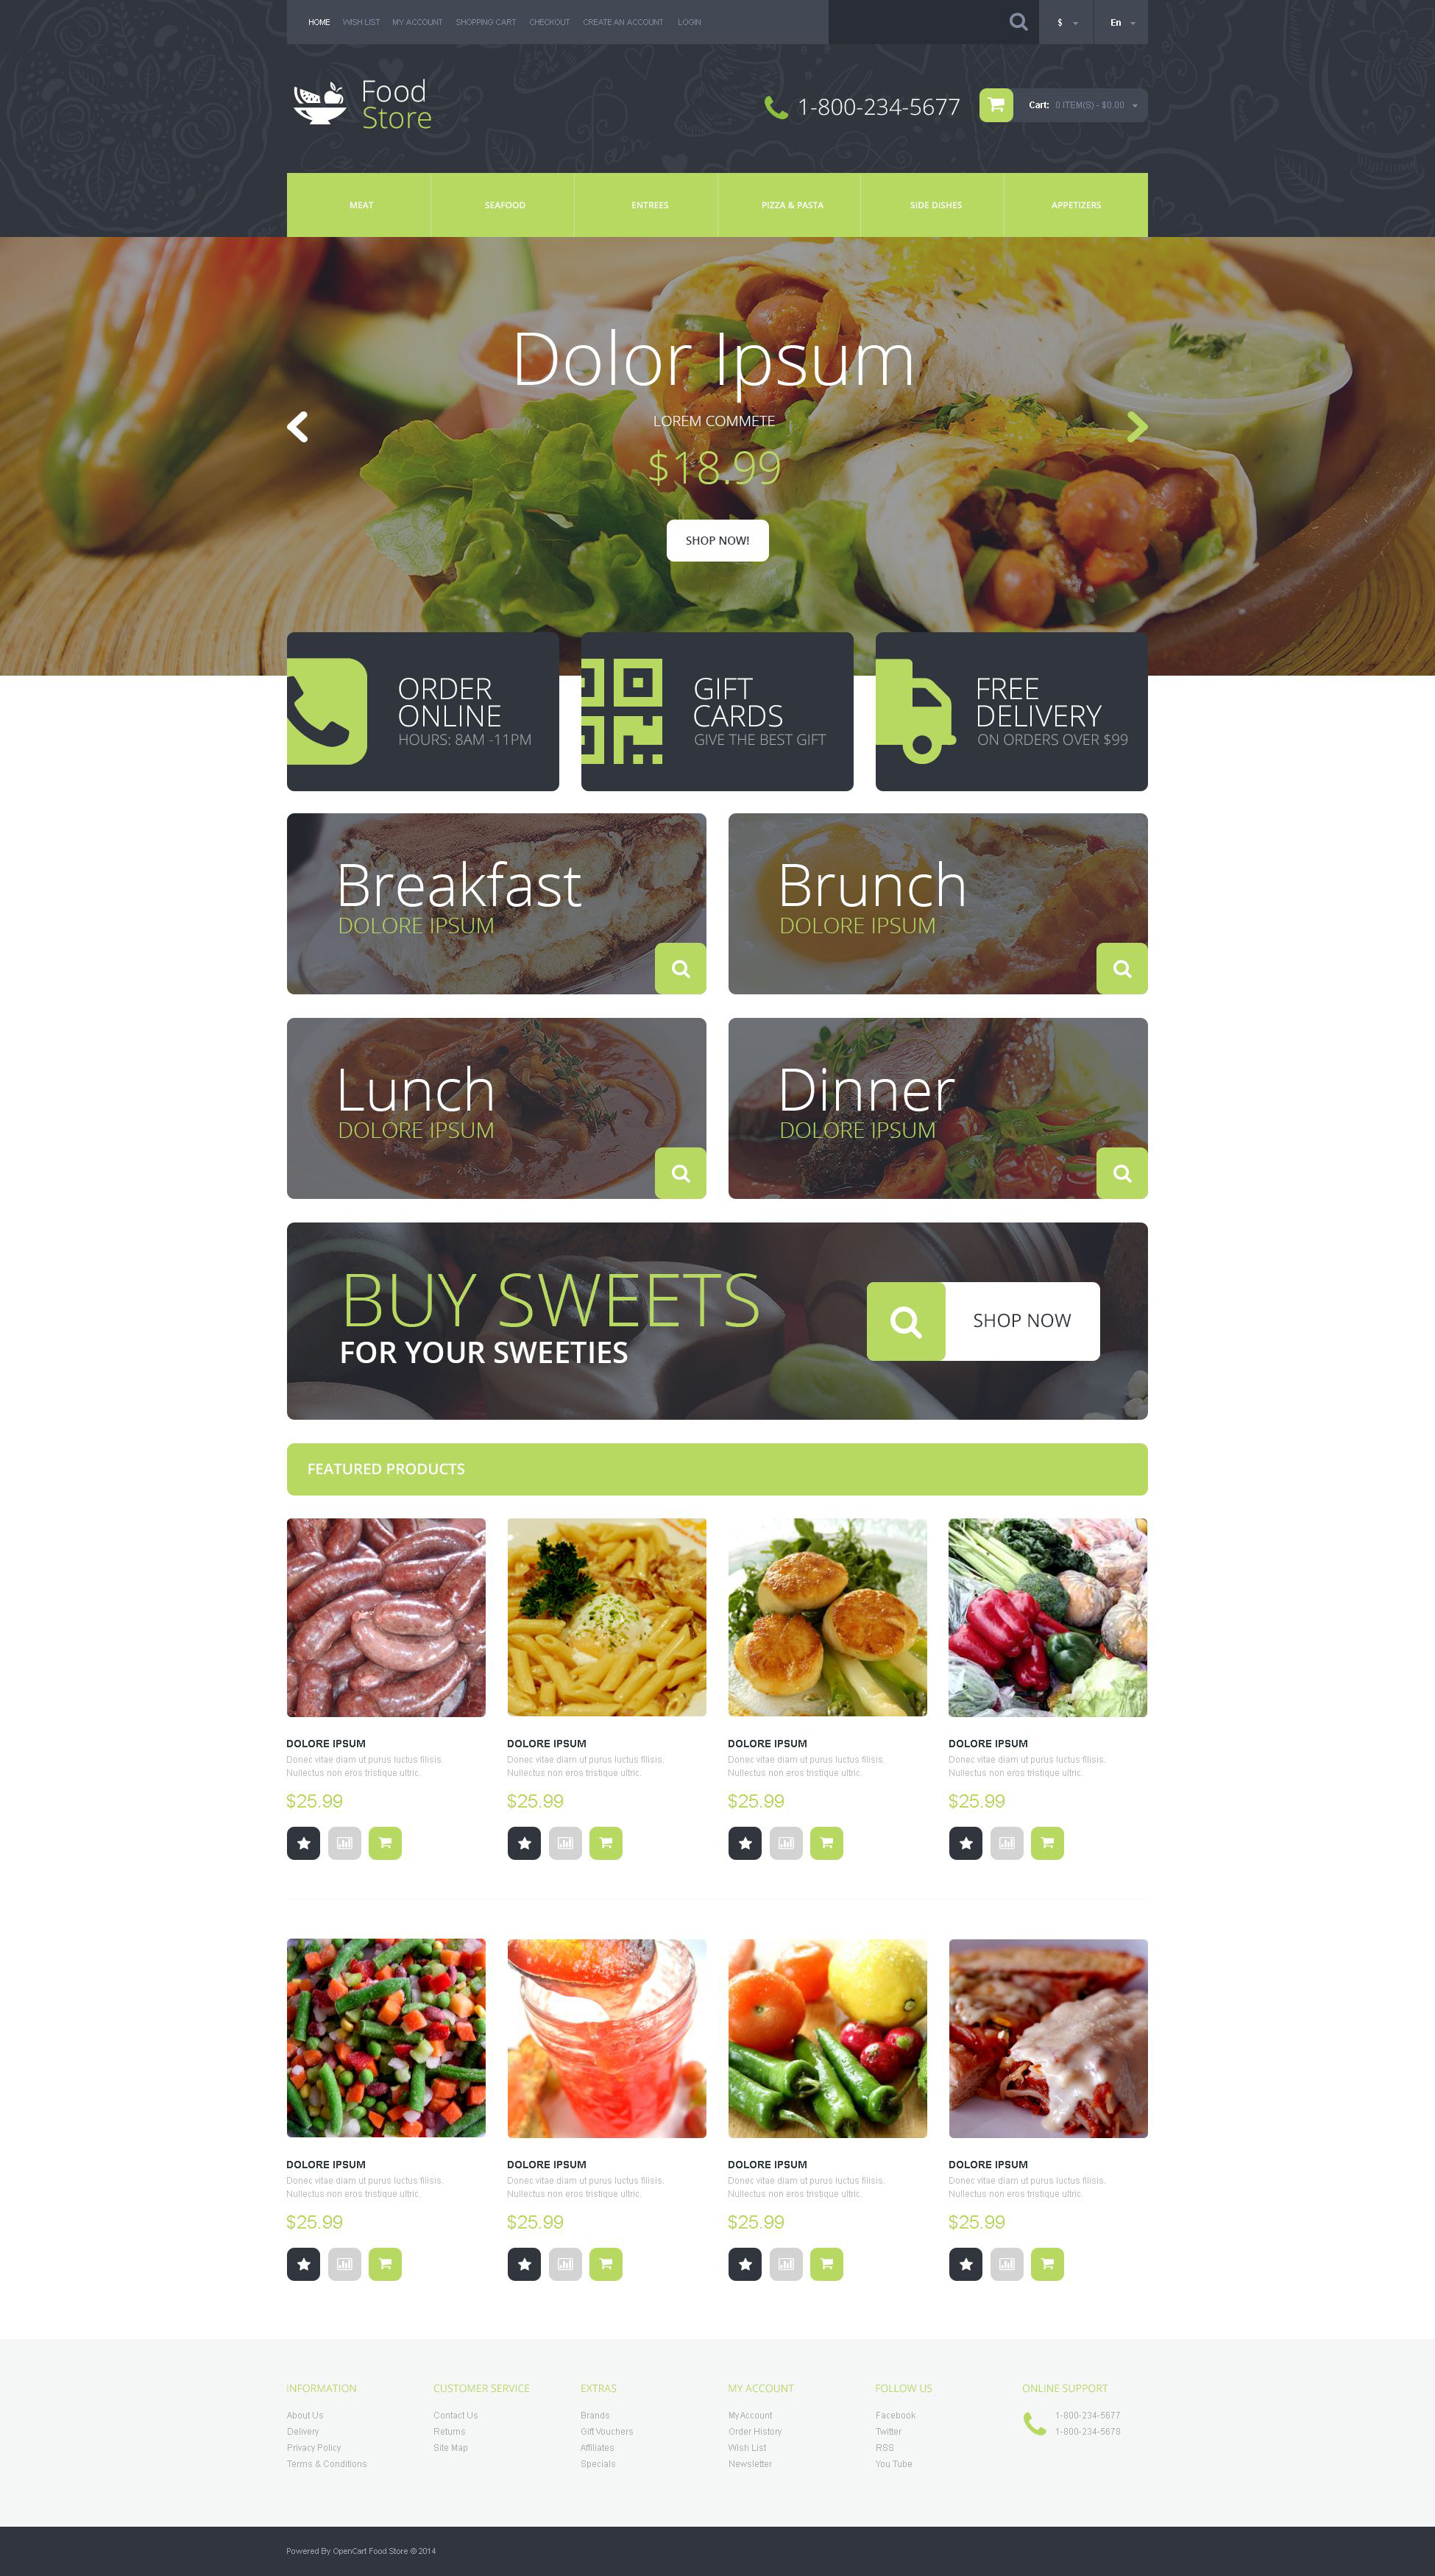 Food Shop №51775 - скриншот